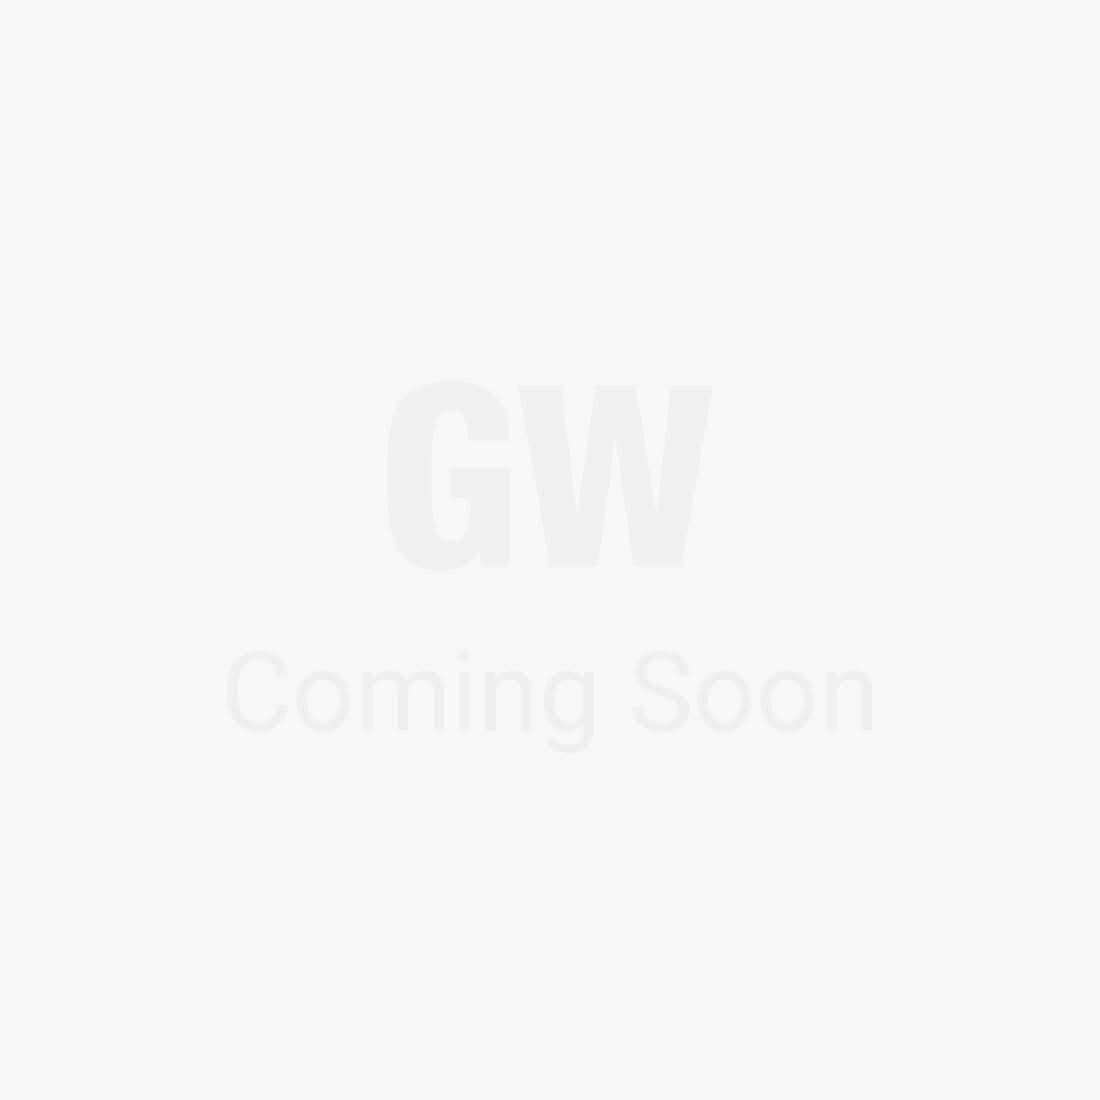 Linea Sleigh Dining Tables